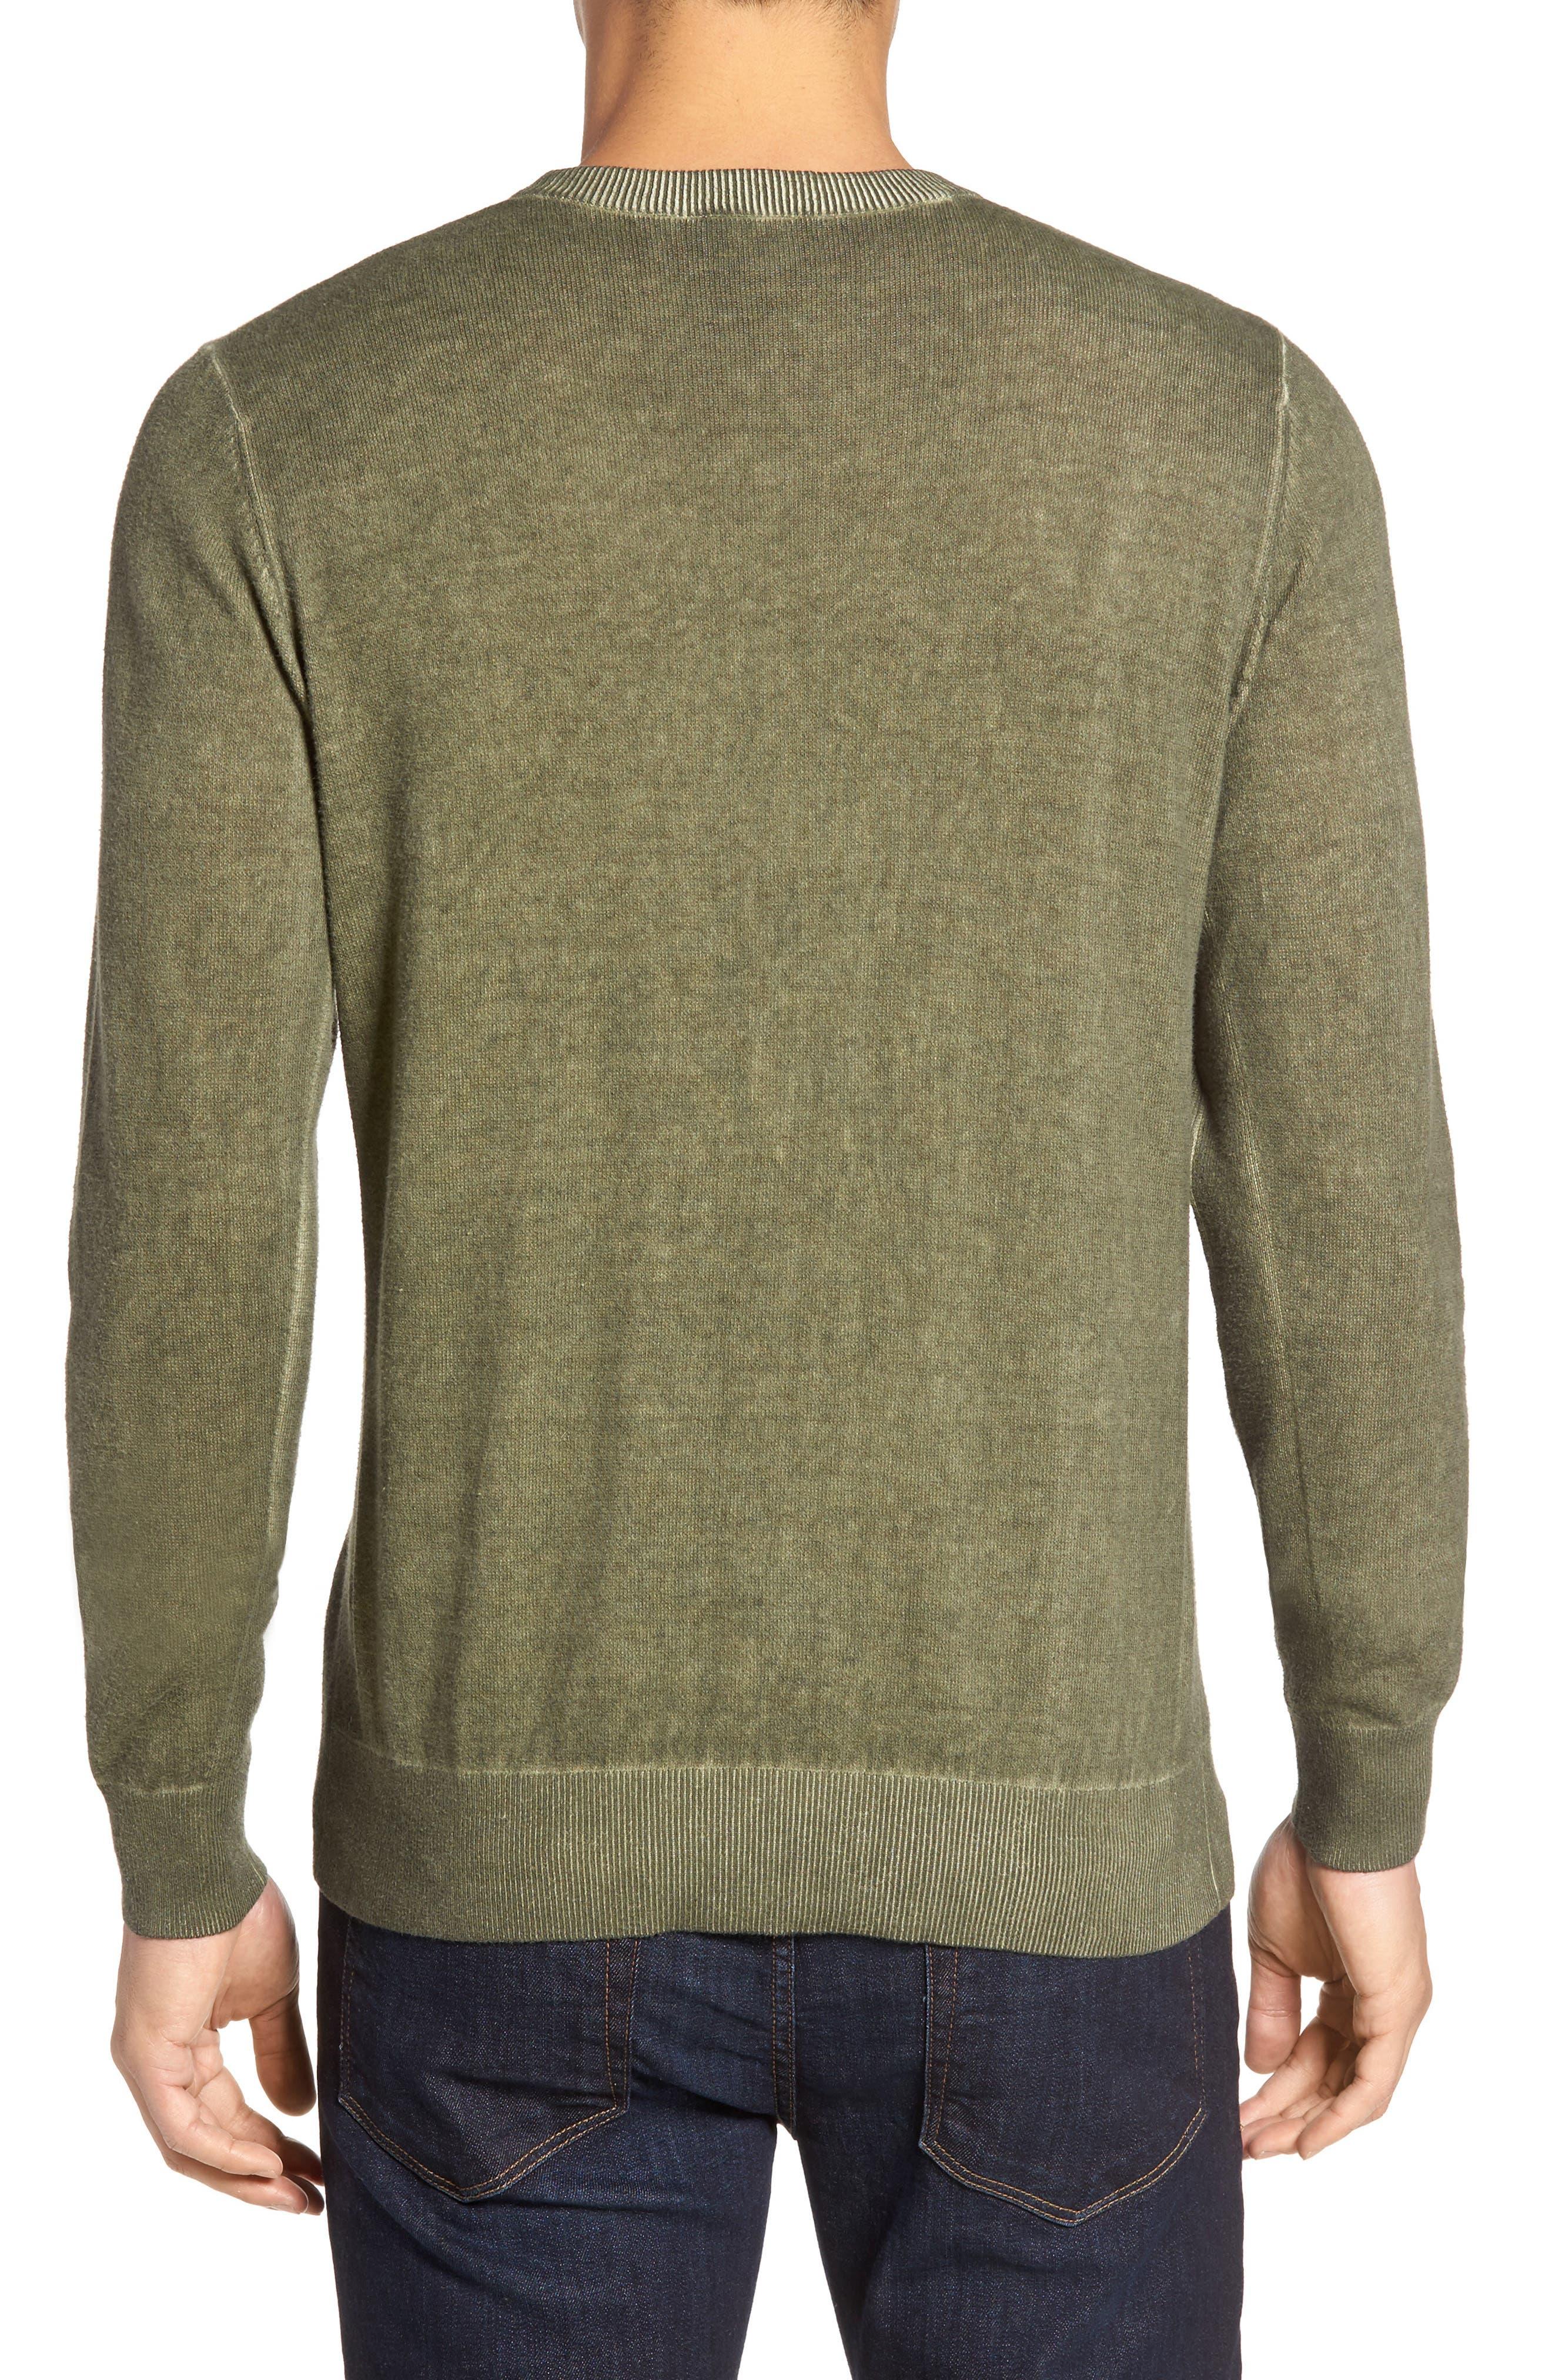 Mace Crewneck Sweater,                             Alternate thumbnail 2, color,                             Moonwash Caper Green